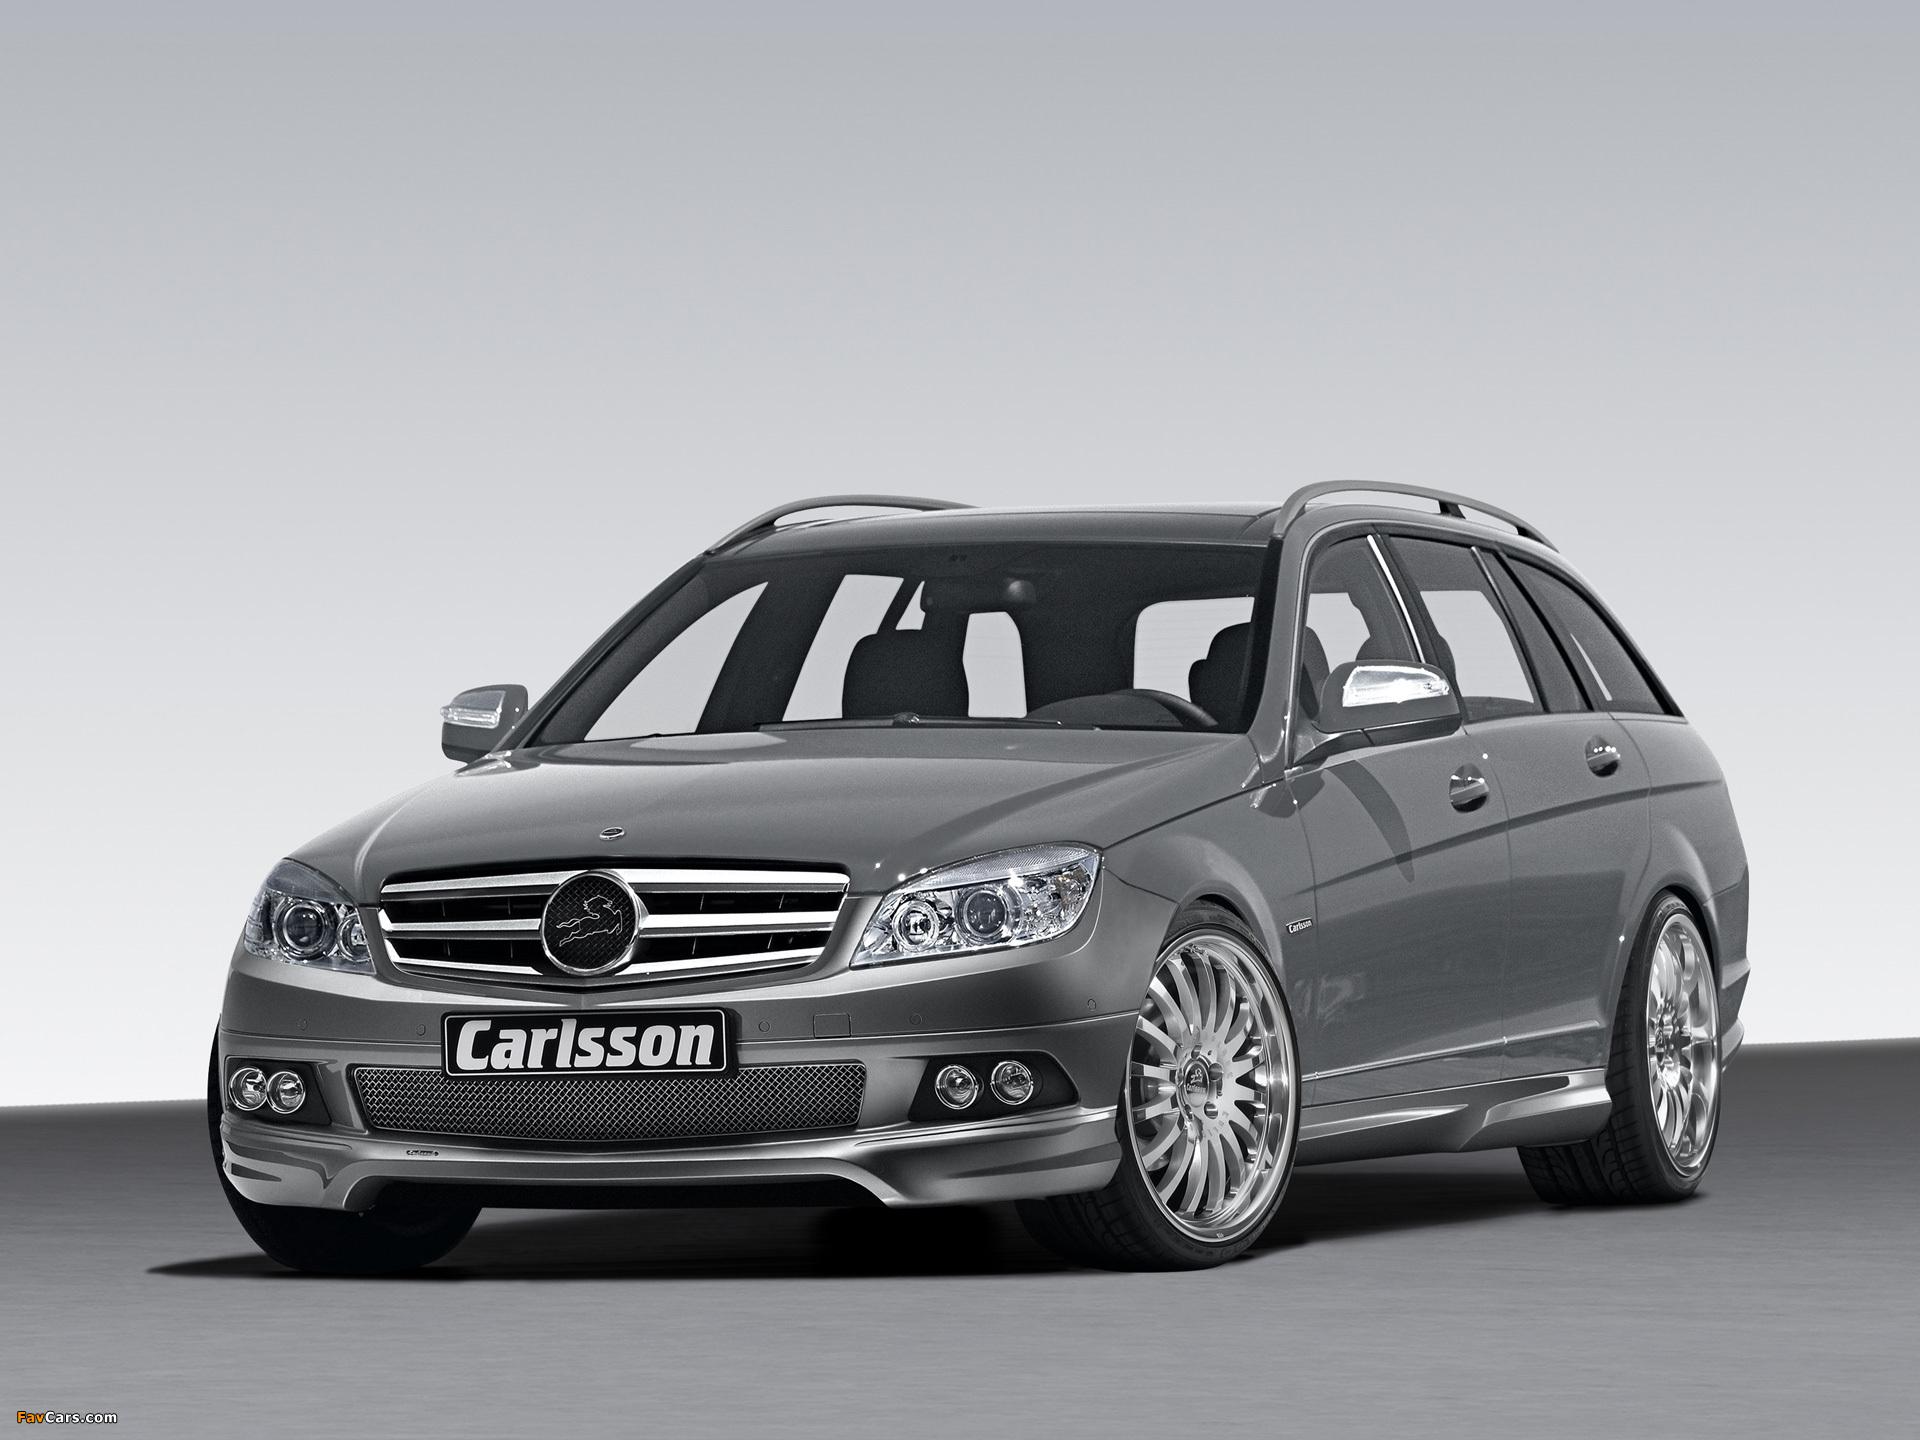 Carlsson Mercedes-Benz C-Klasse Estate (S204) 2008 photos (1920 x 1440)